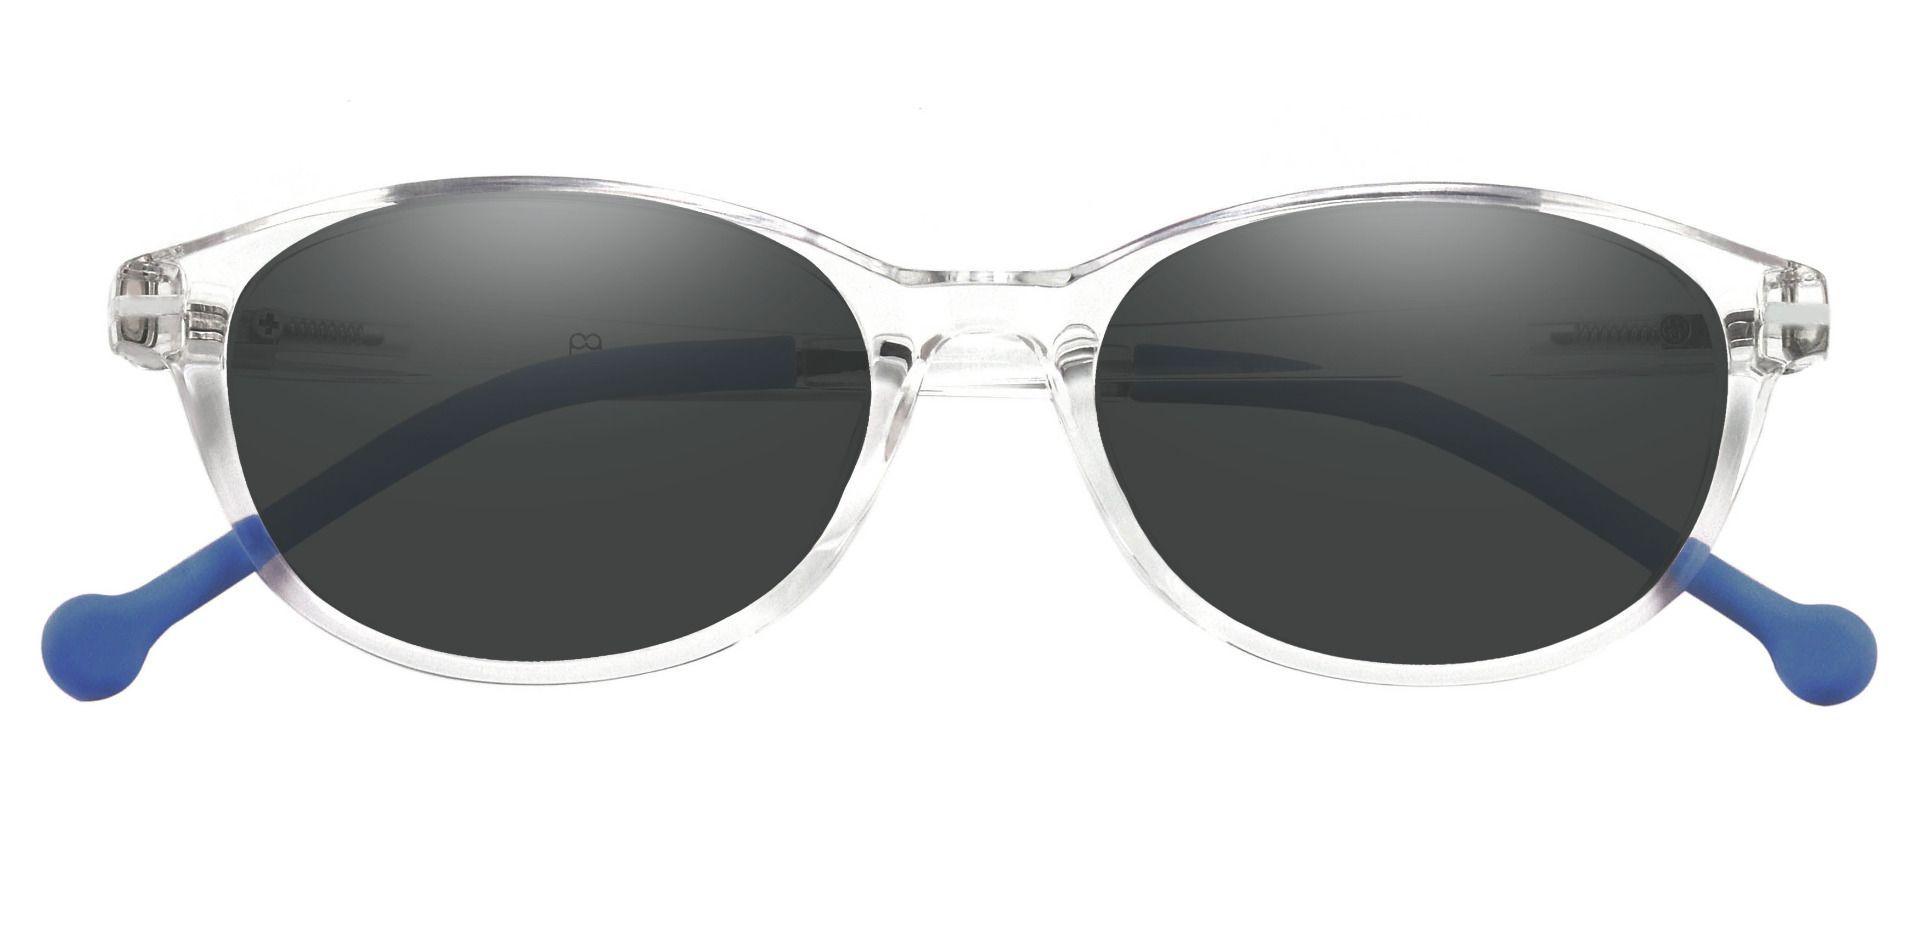 Wander Oval Prescription Sunglasses - Blue Frame With Gray Lenses